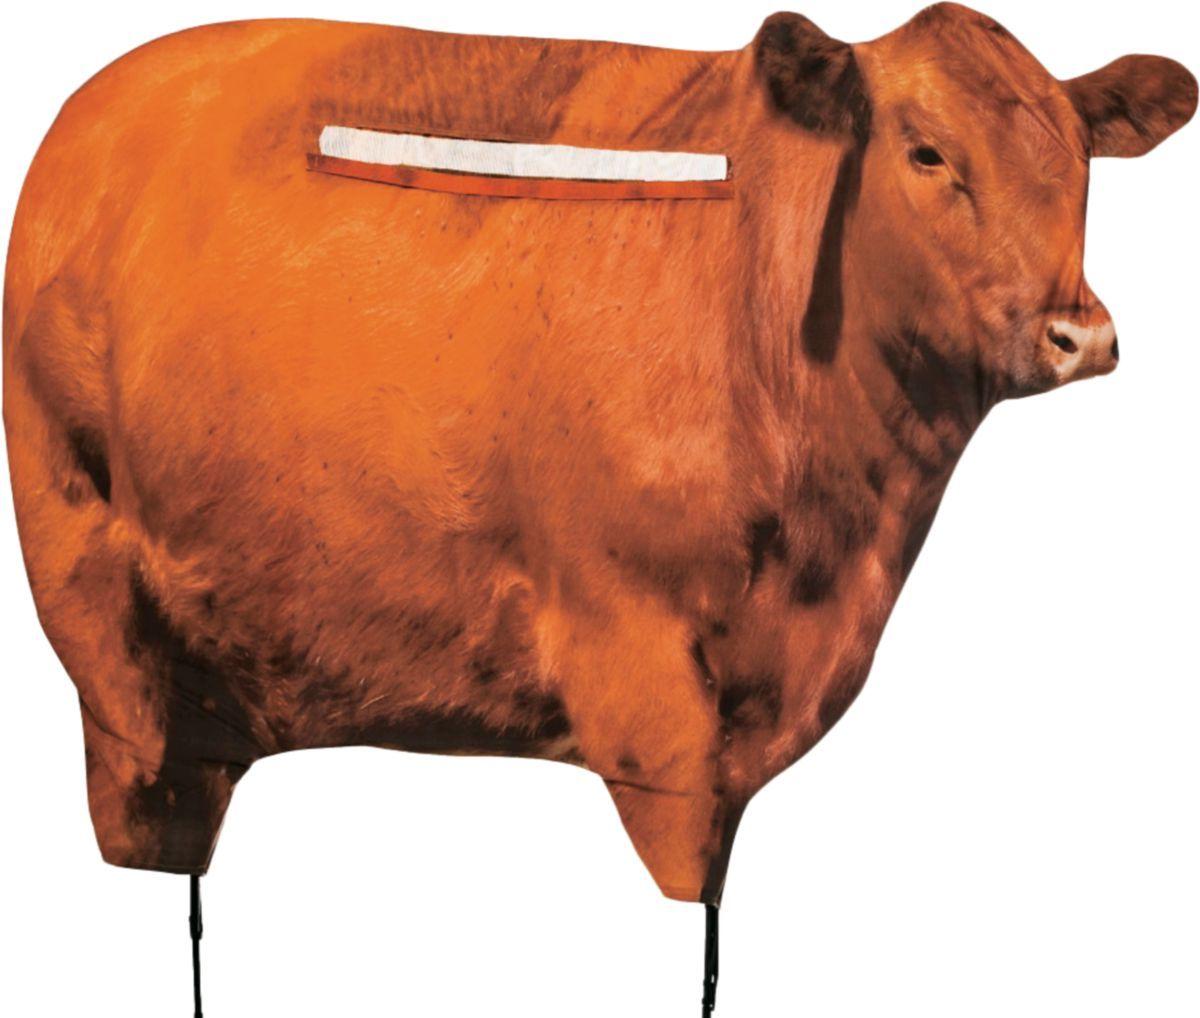 Montana Decoy Big Red Moo Cow Decoy